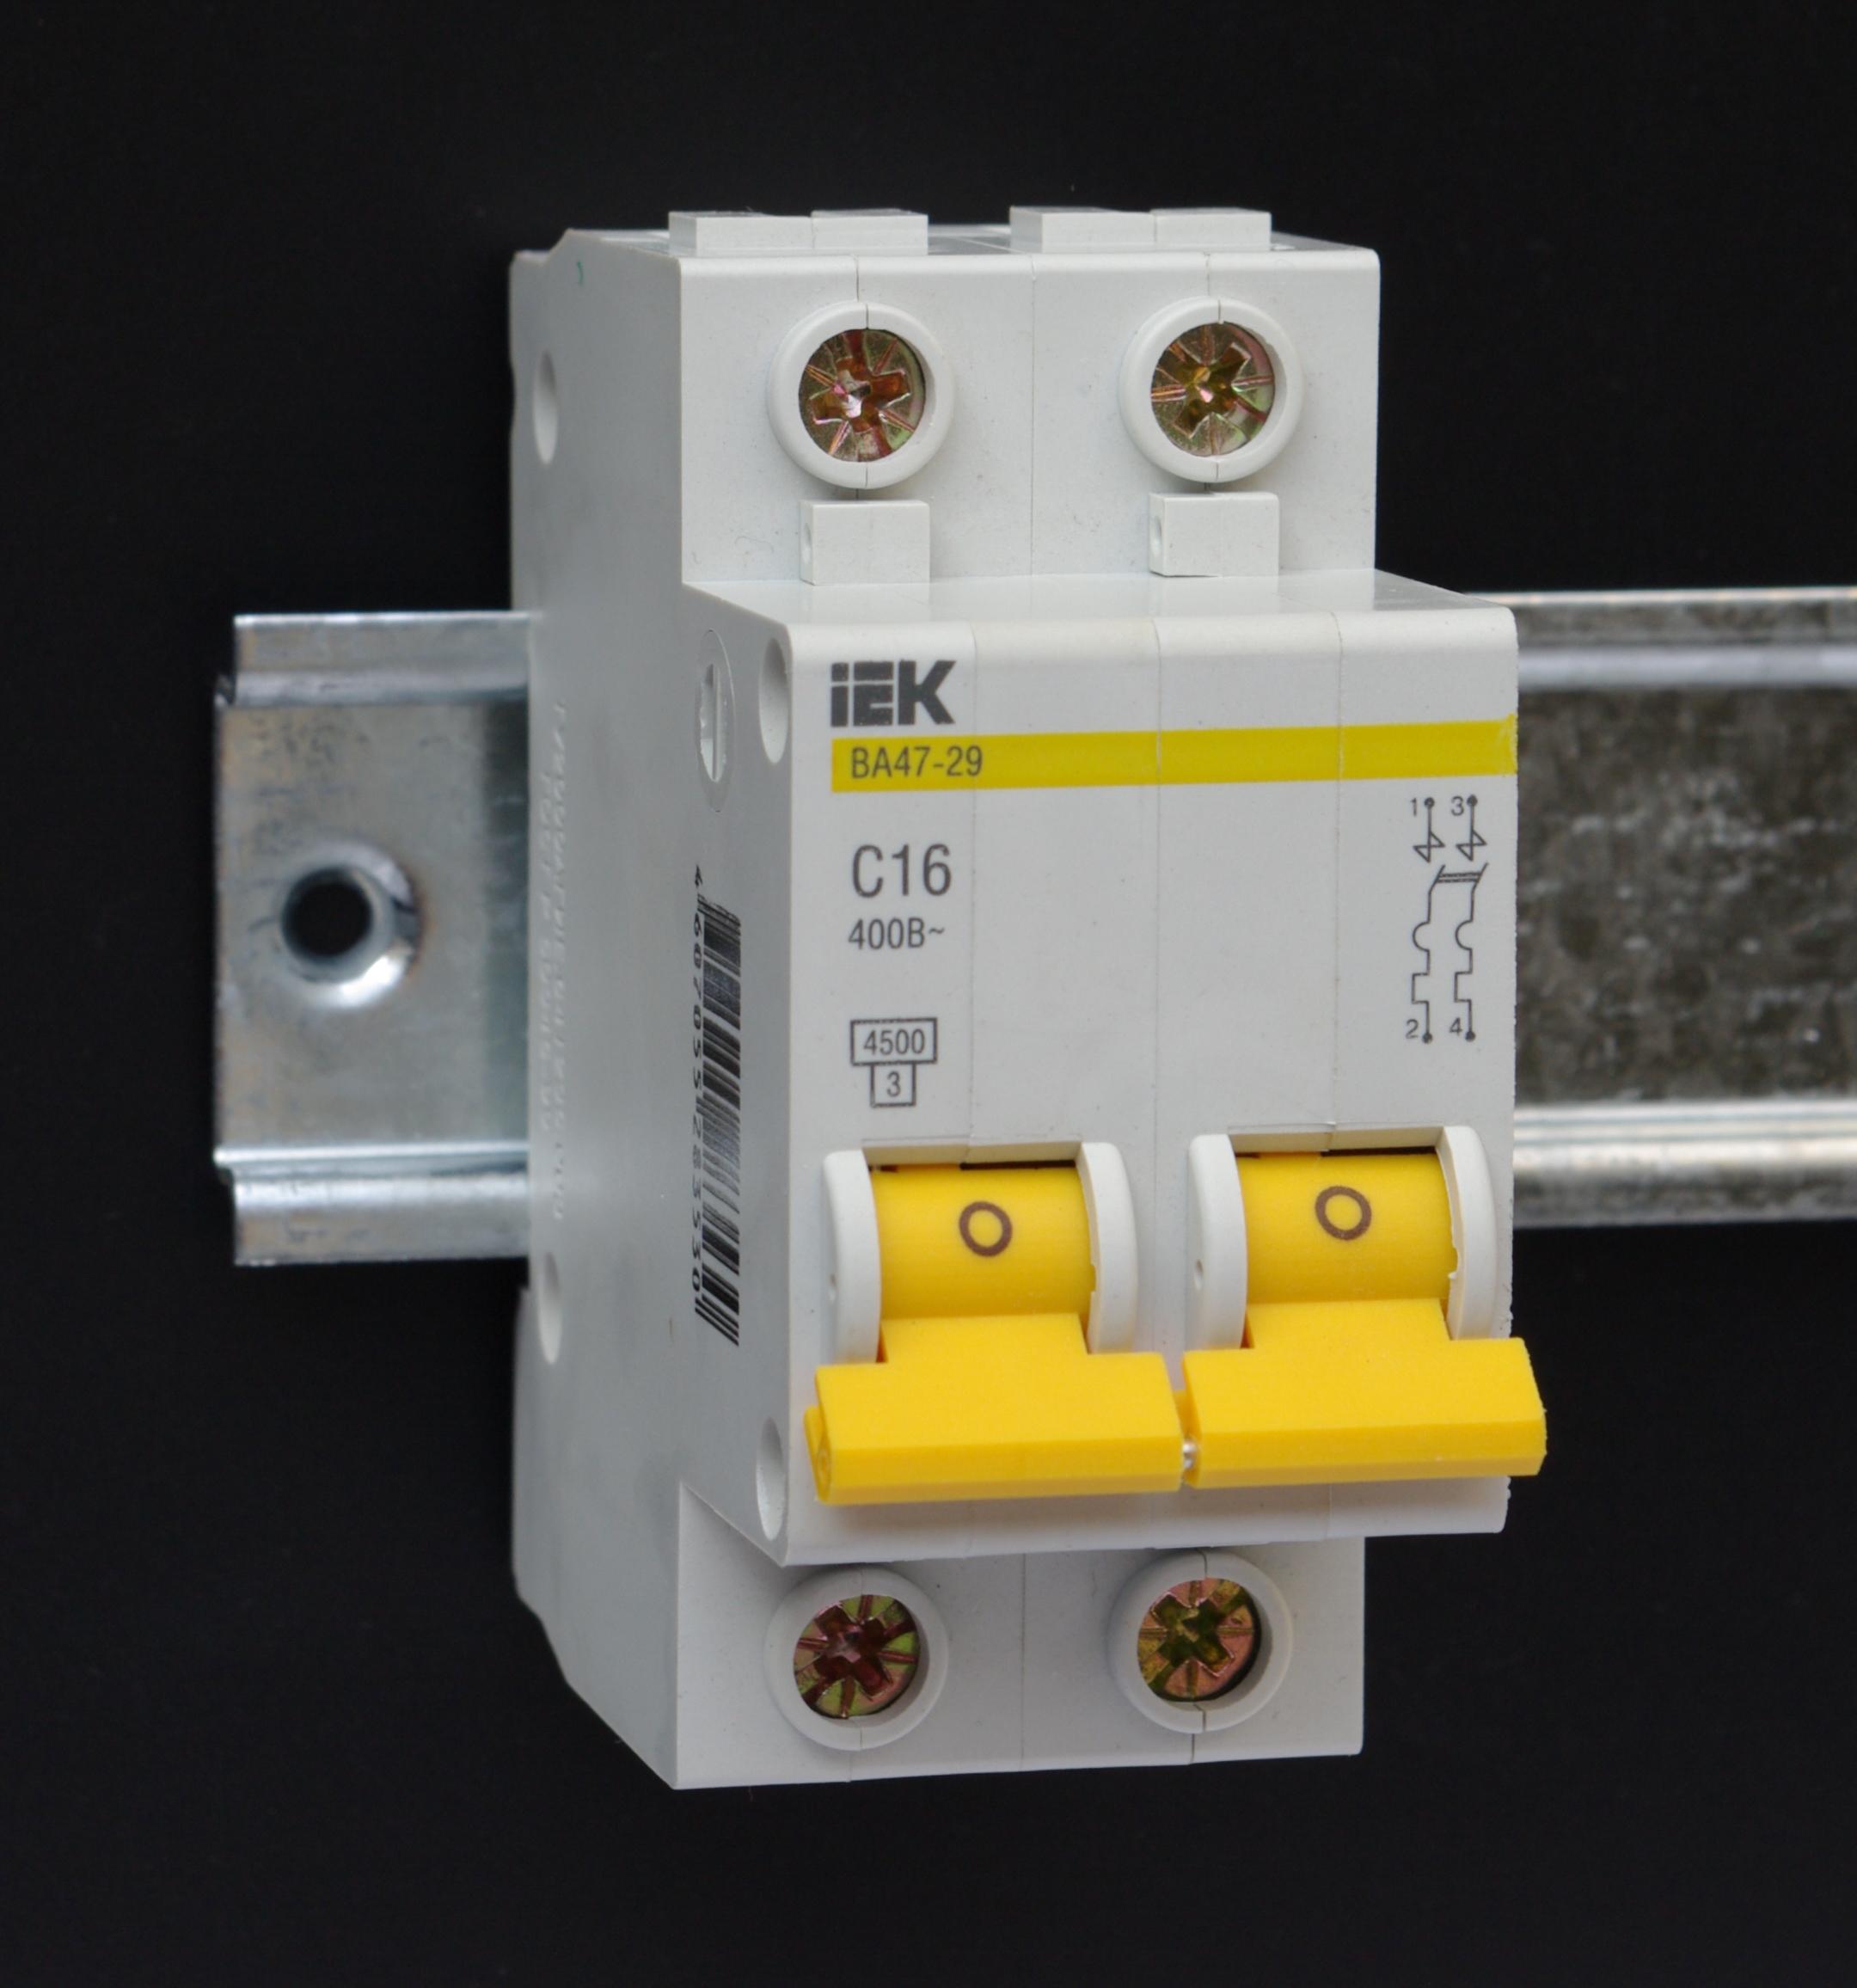 file circuit breaker 2 pole on din rail jpg wikimedia. Black Bedroom Furniture Sets. Home Design Ideas